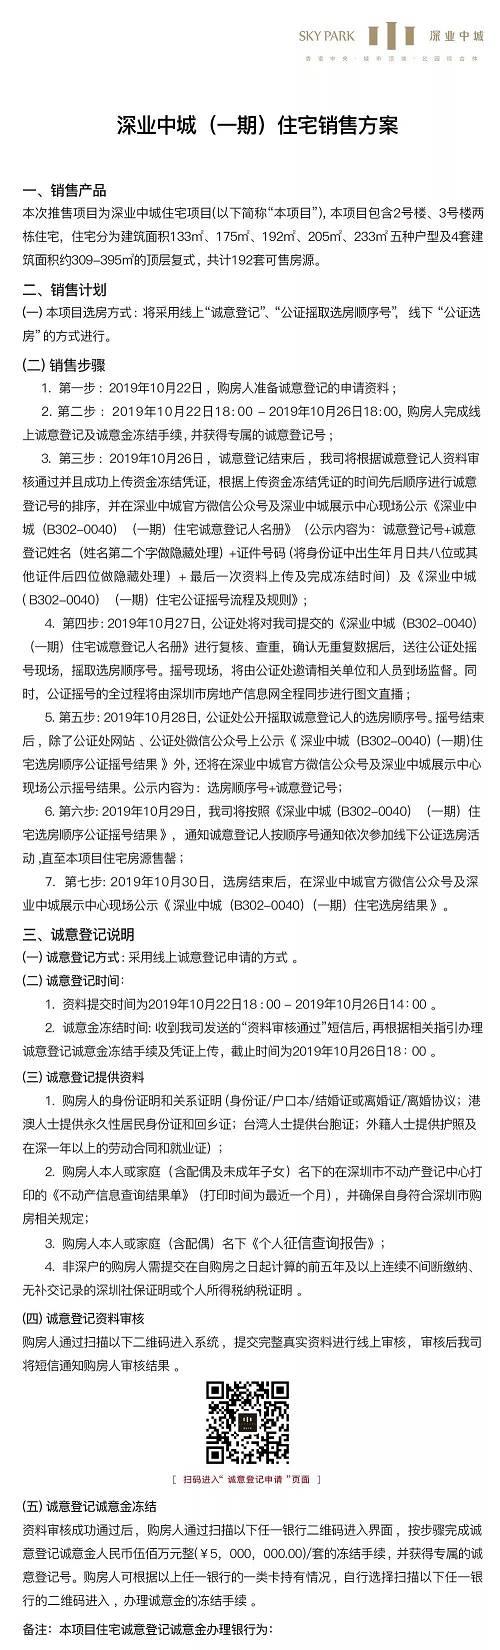 <b>中一套或赚300万!深圳最火抢房来了:诚意金500万,192套房已有4000人抢?贫穷再次限制了我的想象……</b>